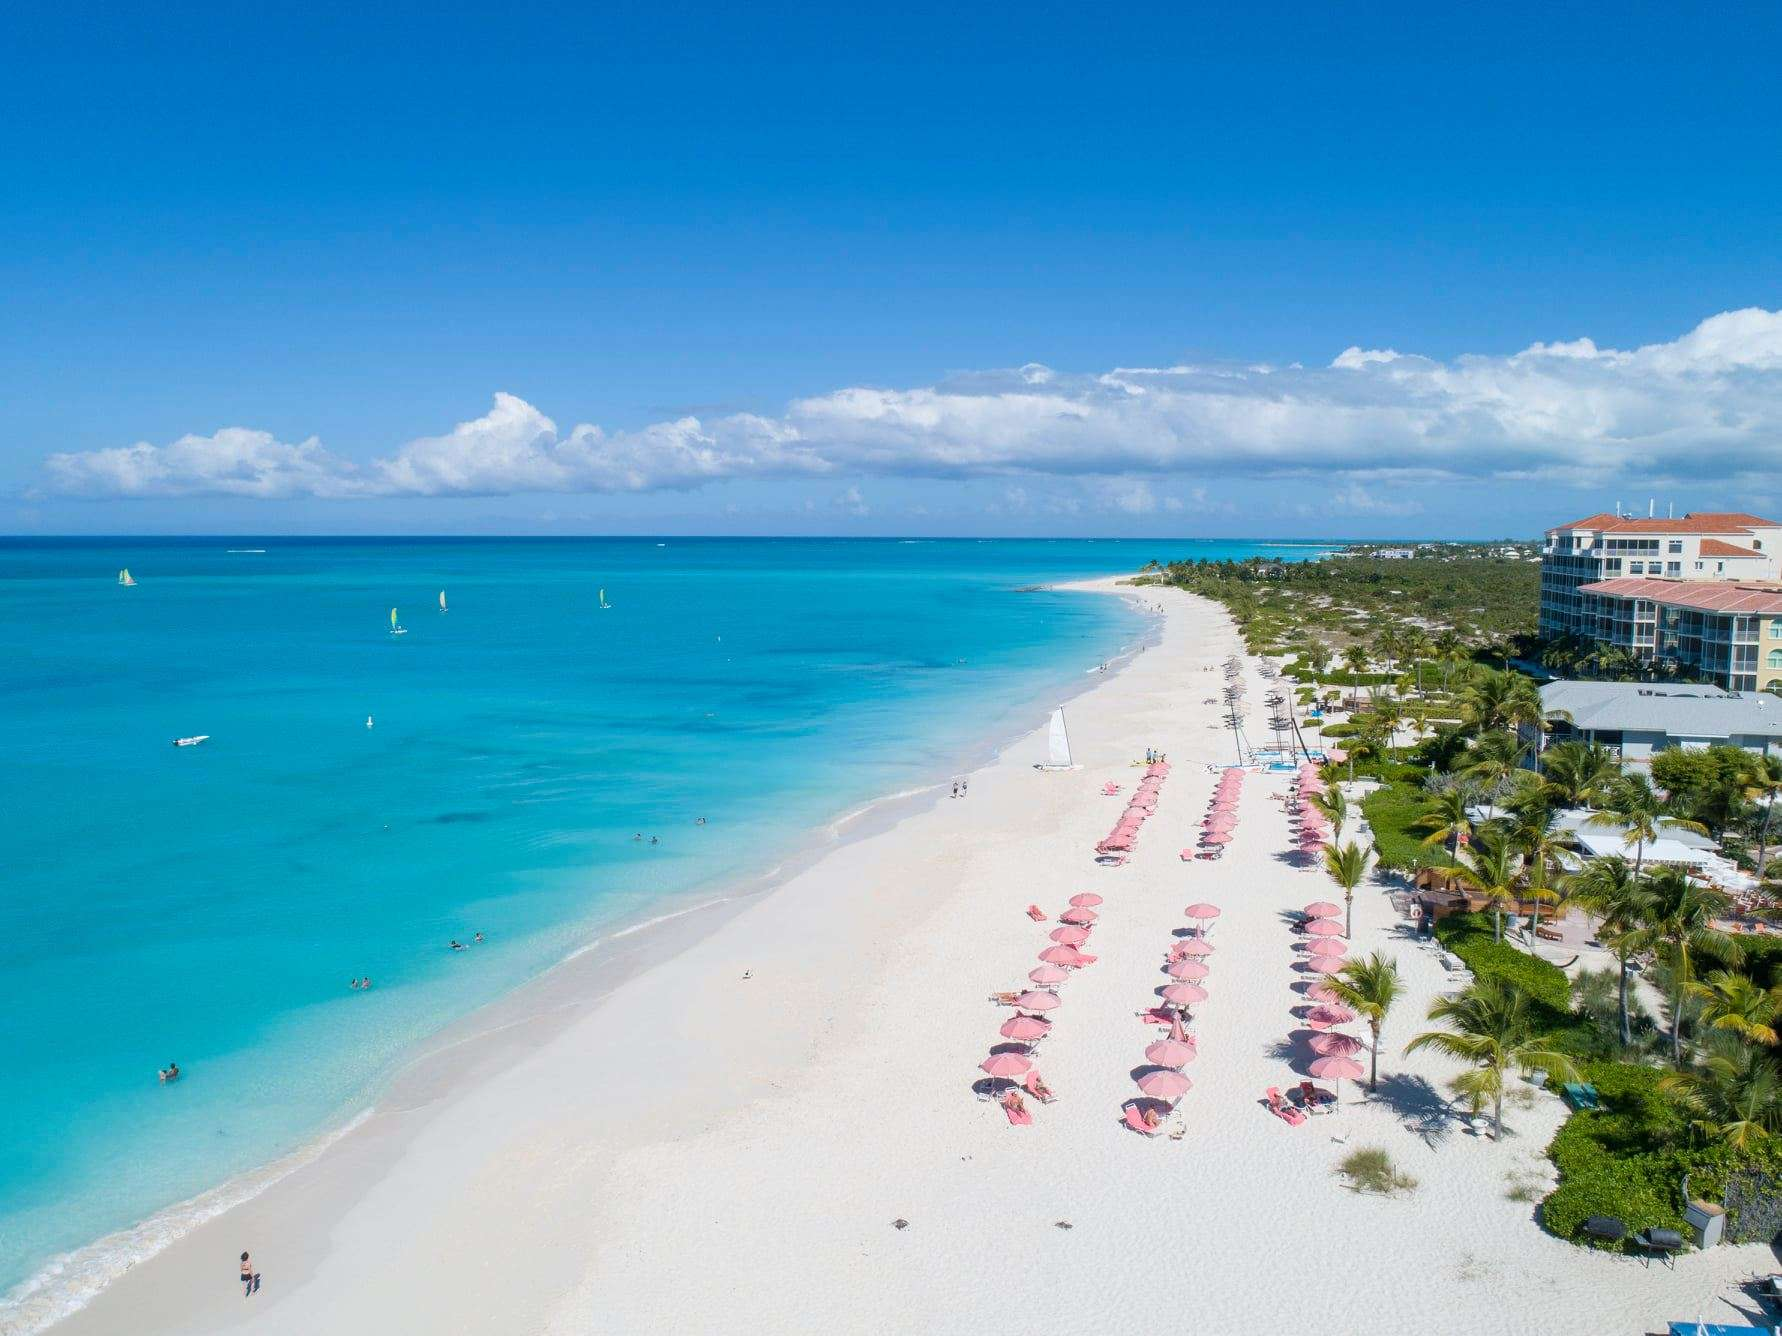 Ocean Club on Grace Bay Beach in Turks and Caicos